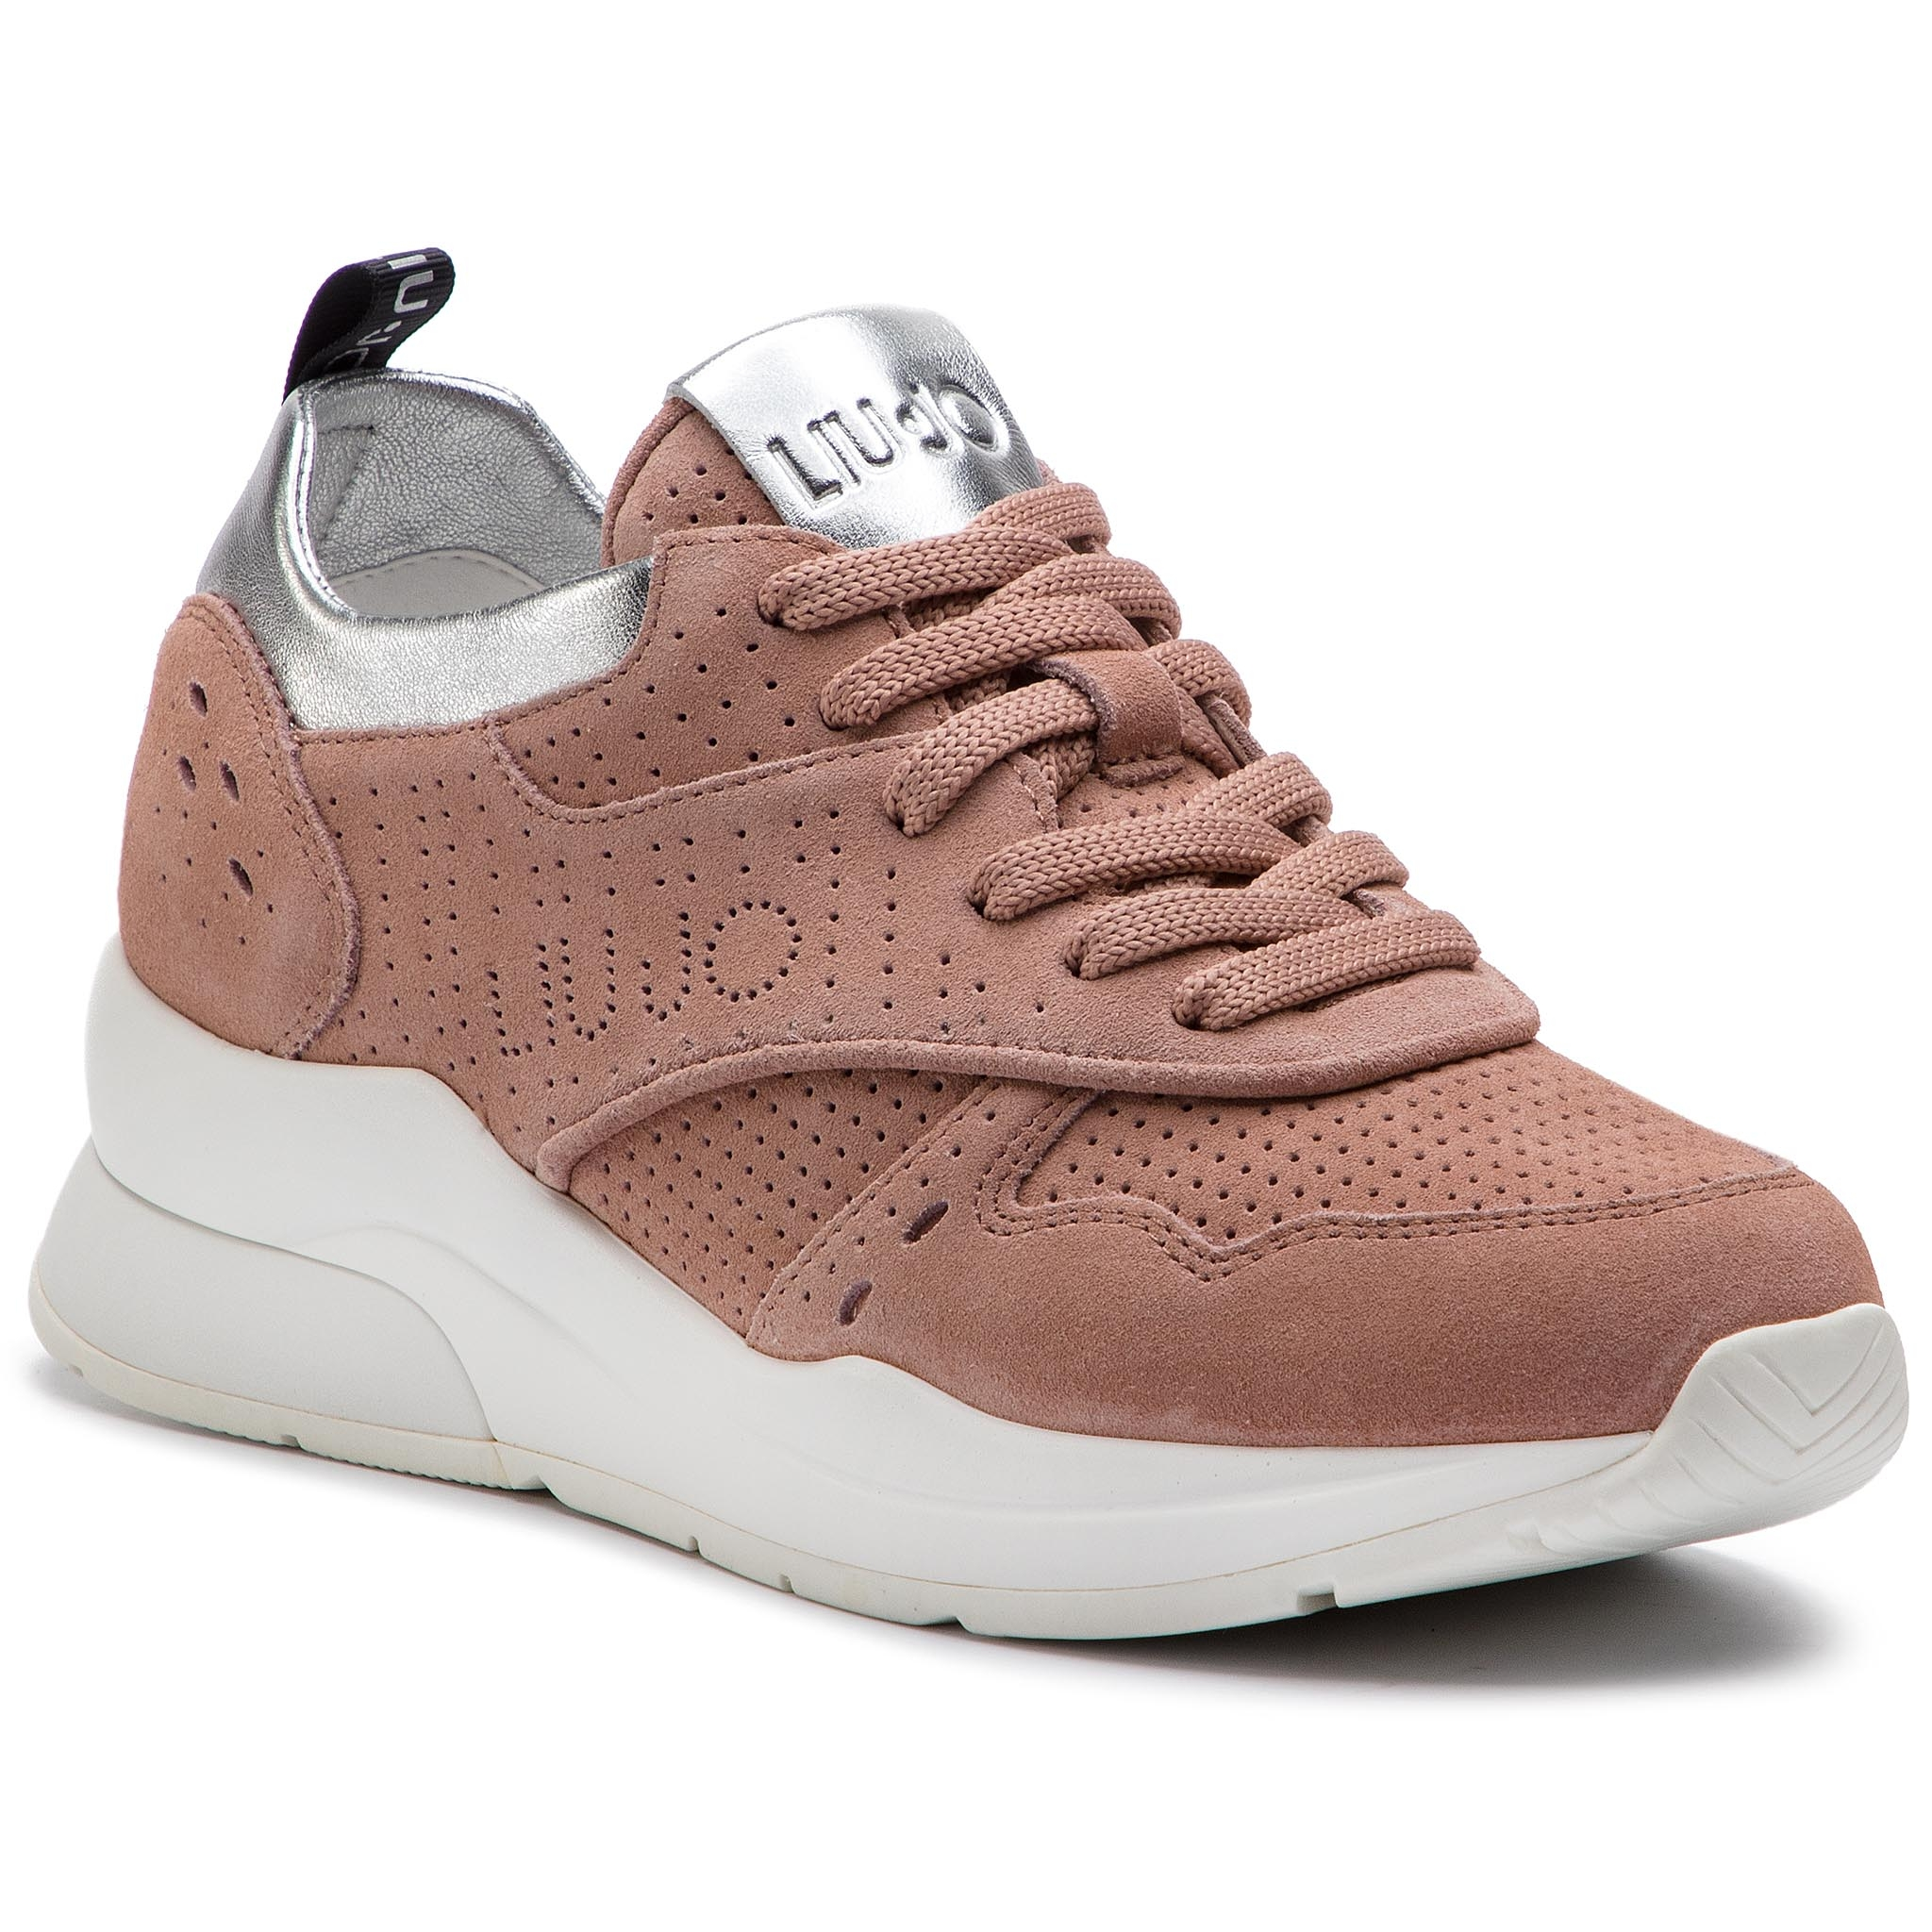 Sneakers LIU JO - Karlie 14 B19009 PX025 Peach 31406 - Glami.ro 59aac9b4ccc